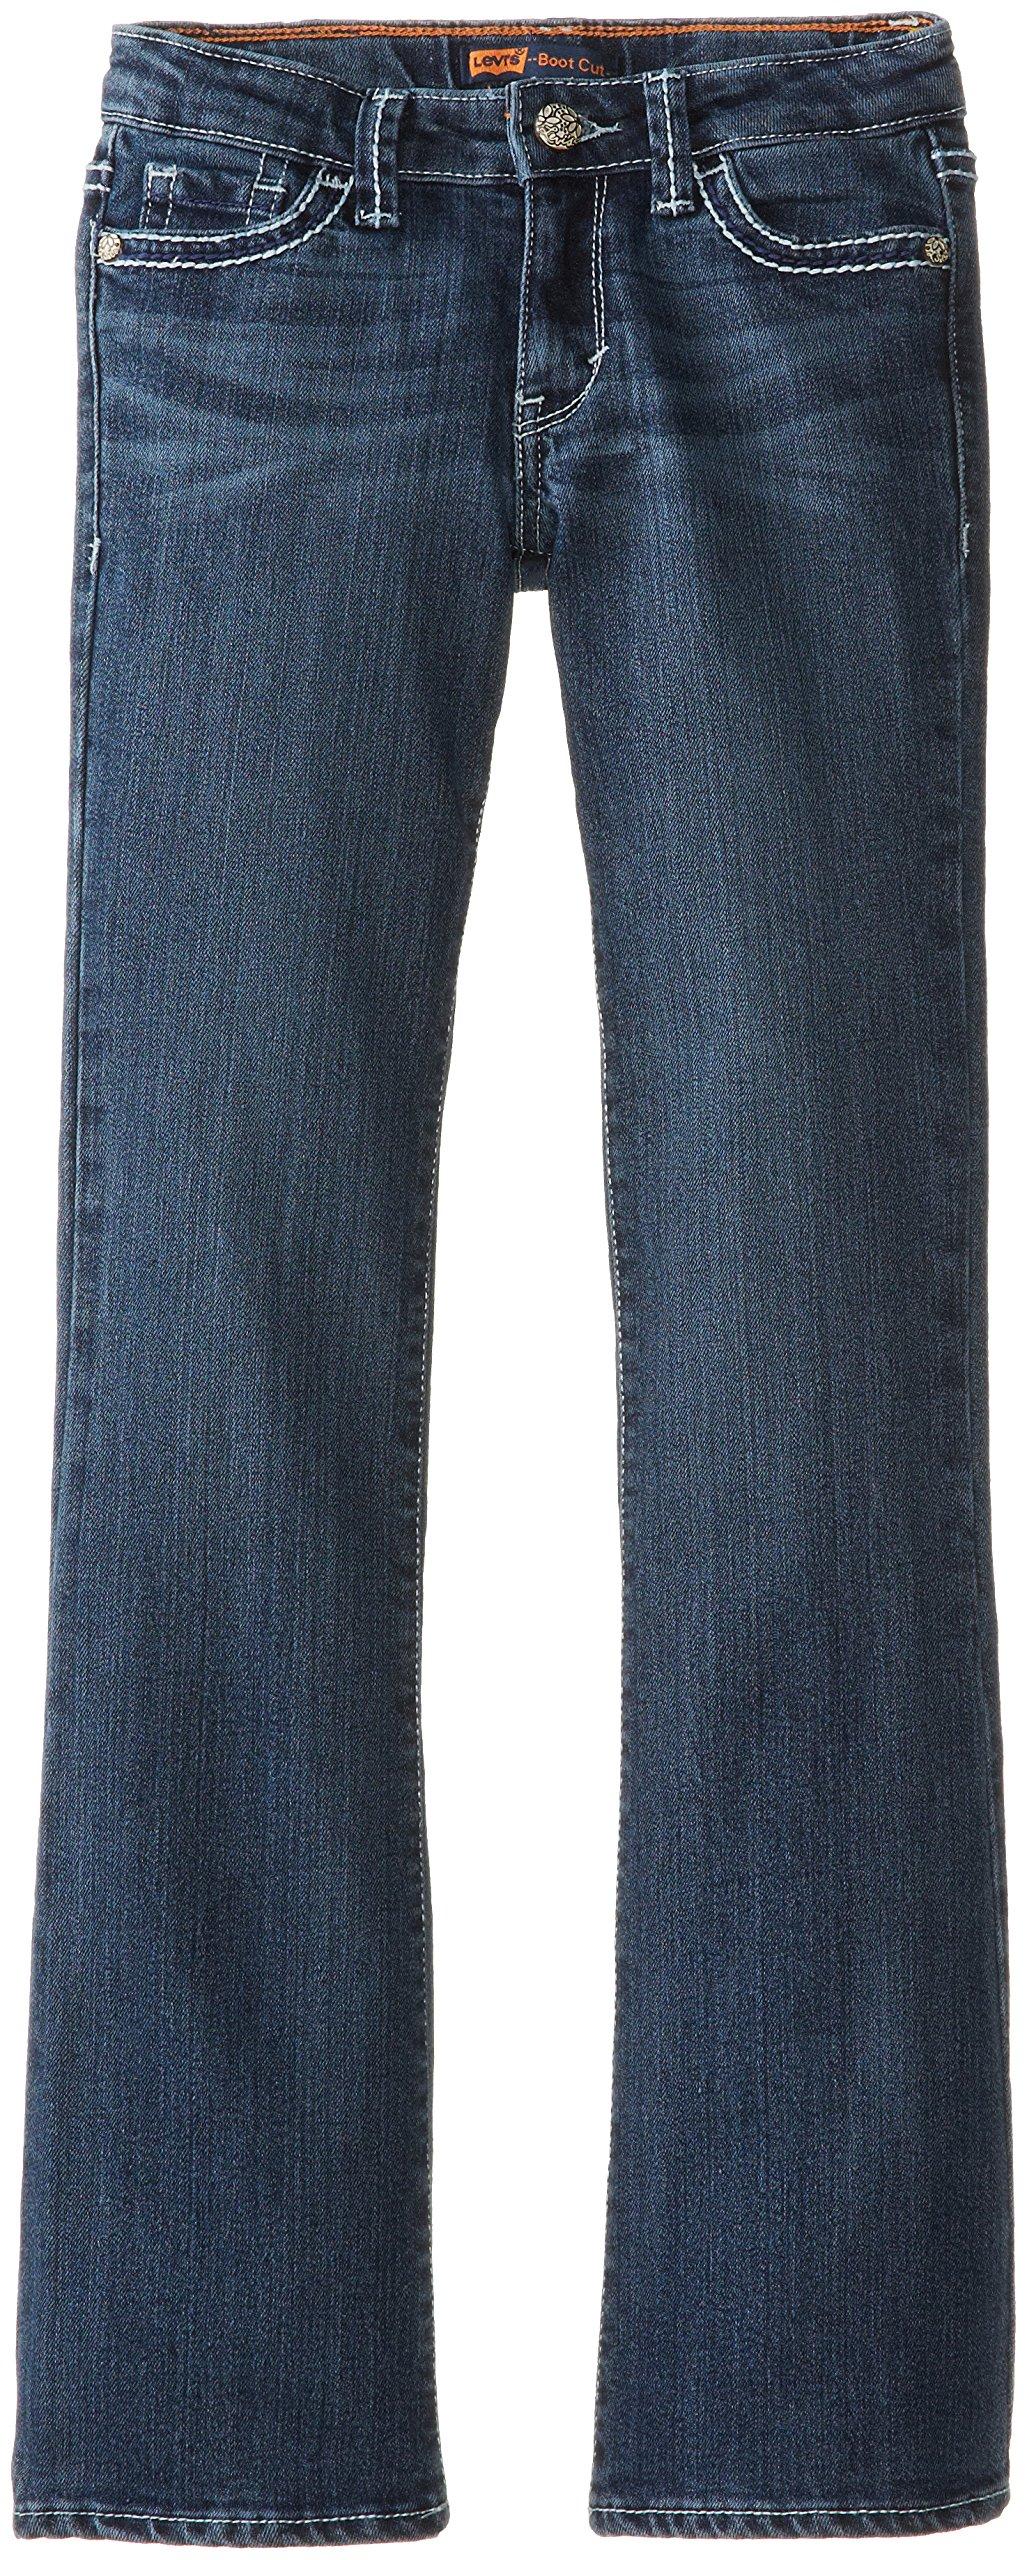 Levi's Girls 715 Bootcut Thick Stitch Jeans, Blue